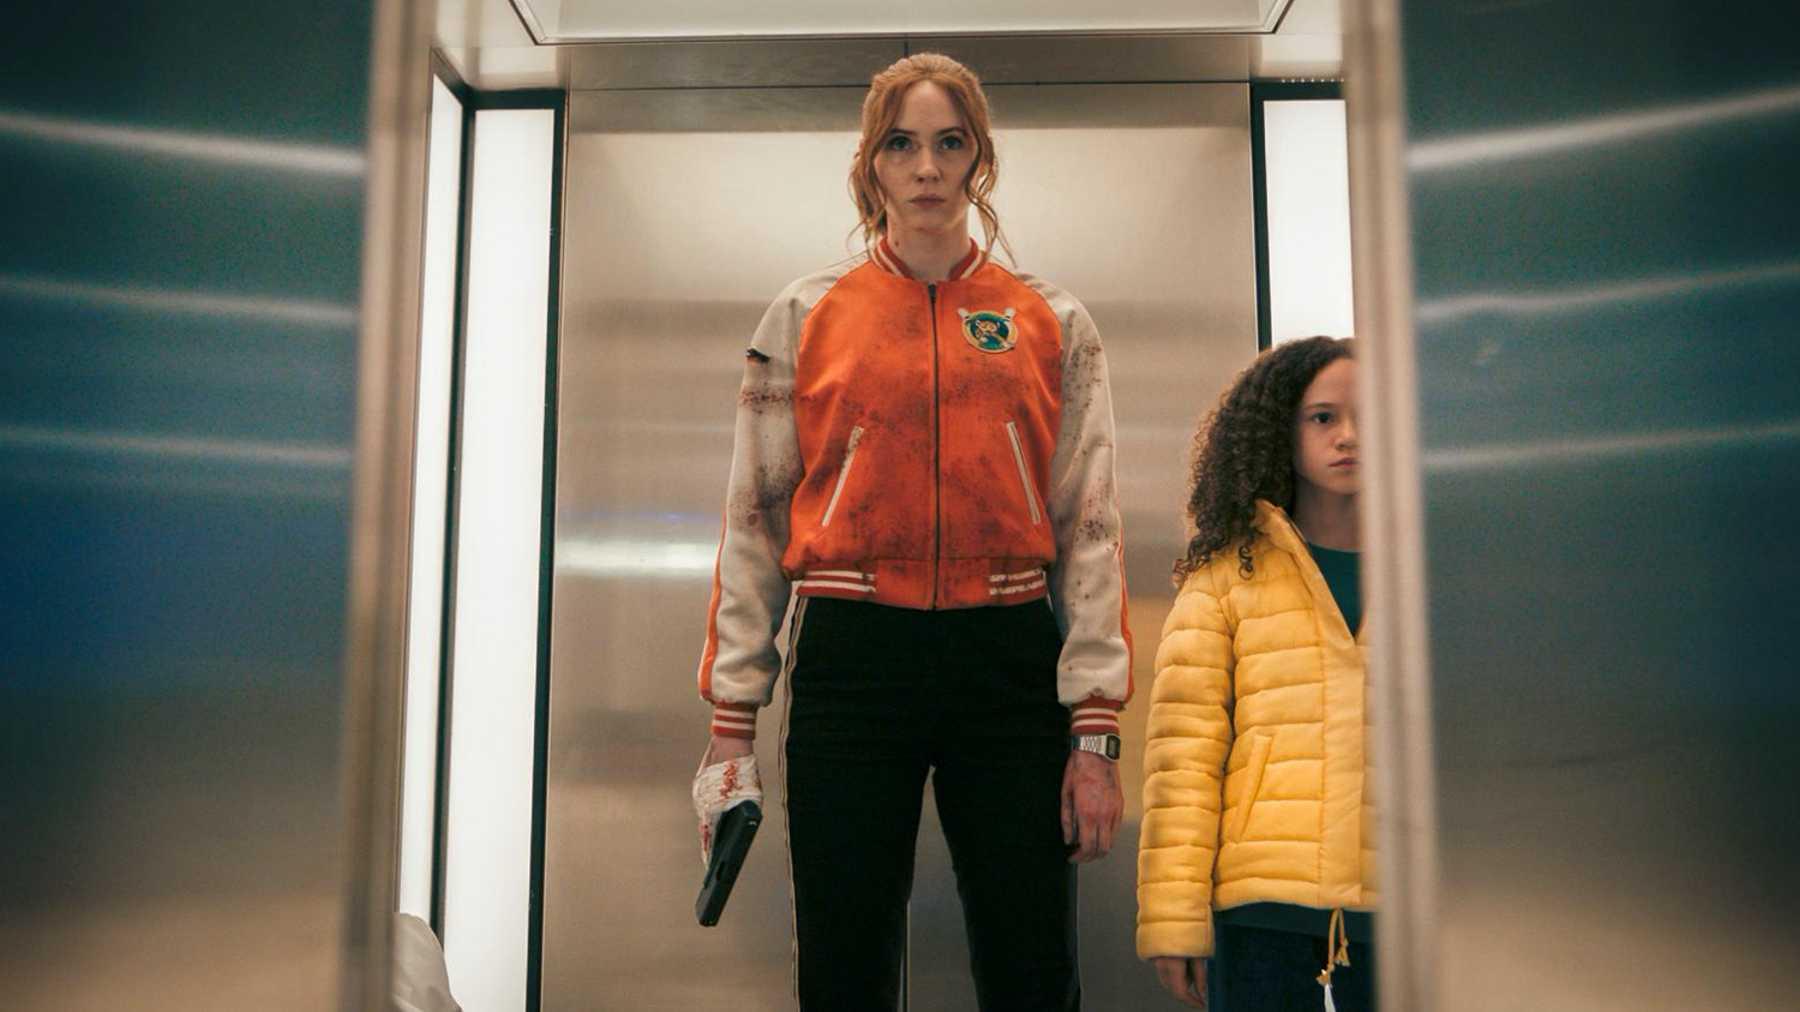 Cinema News: Karen Gillan in Gunpowder Milkshake